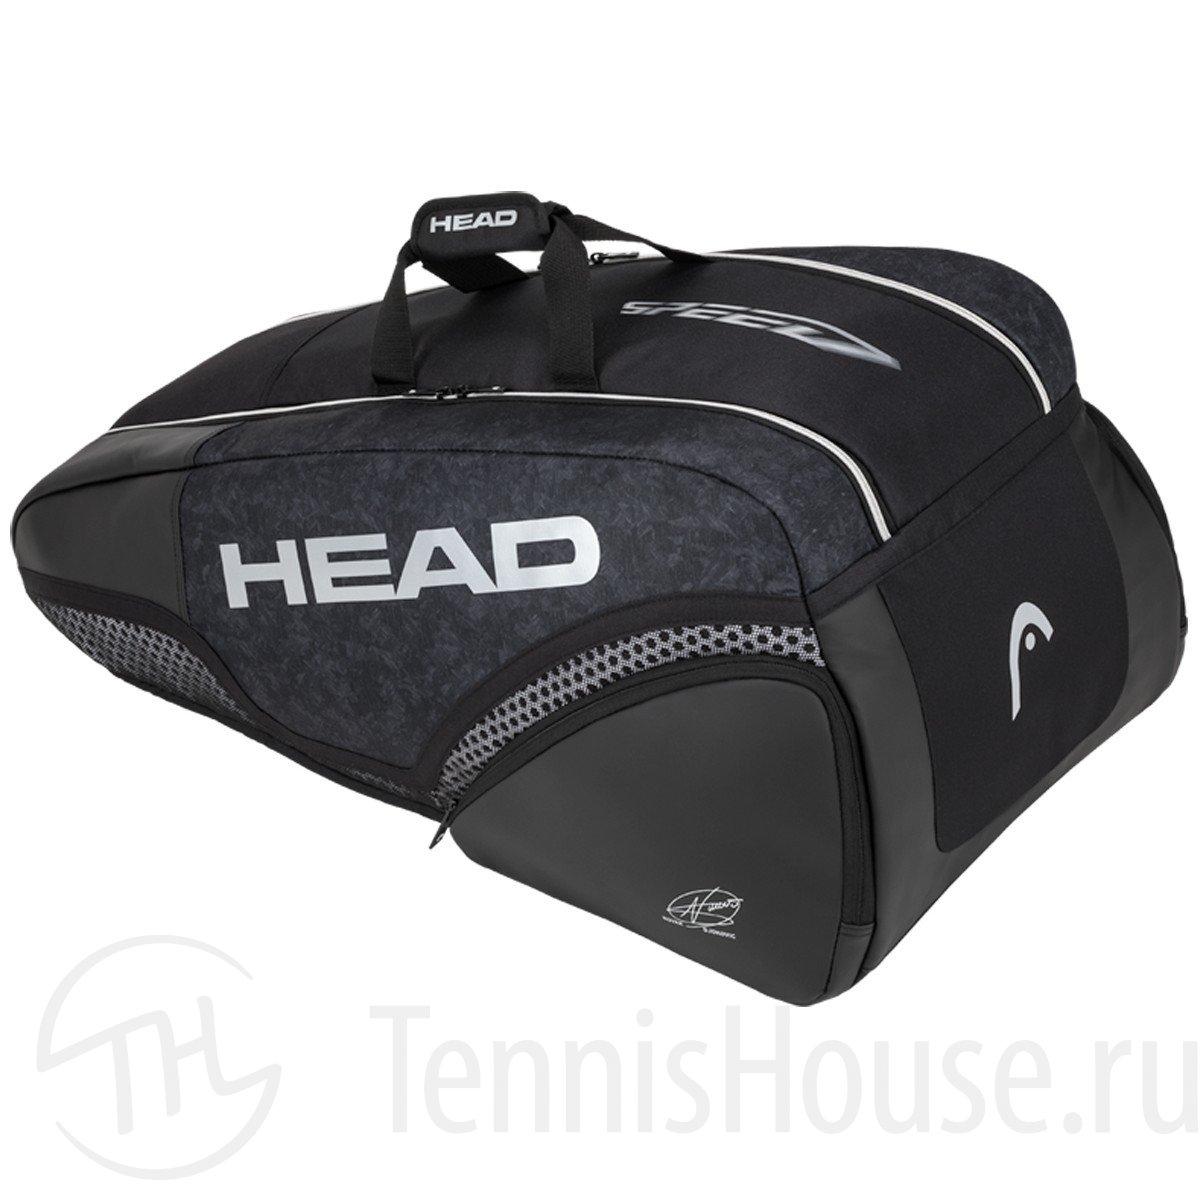 Сумка Head Djokovic Supercombi 9R 283050